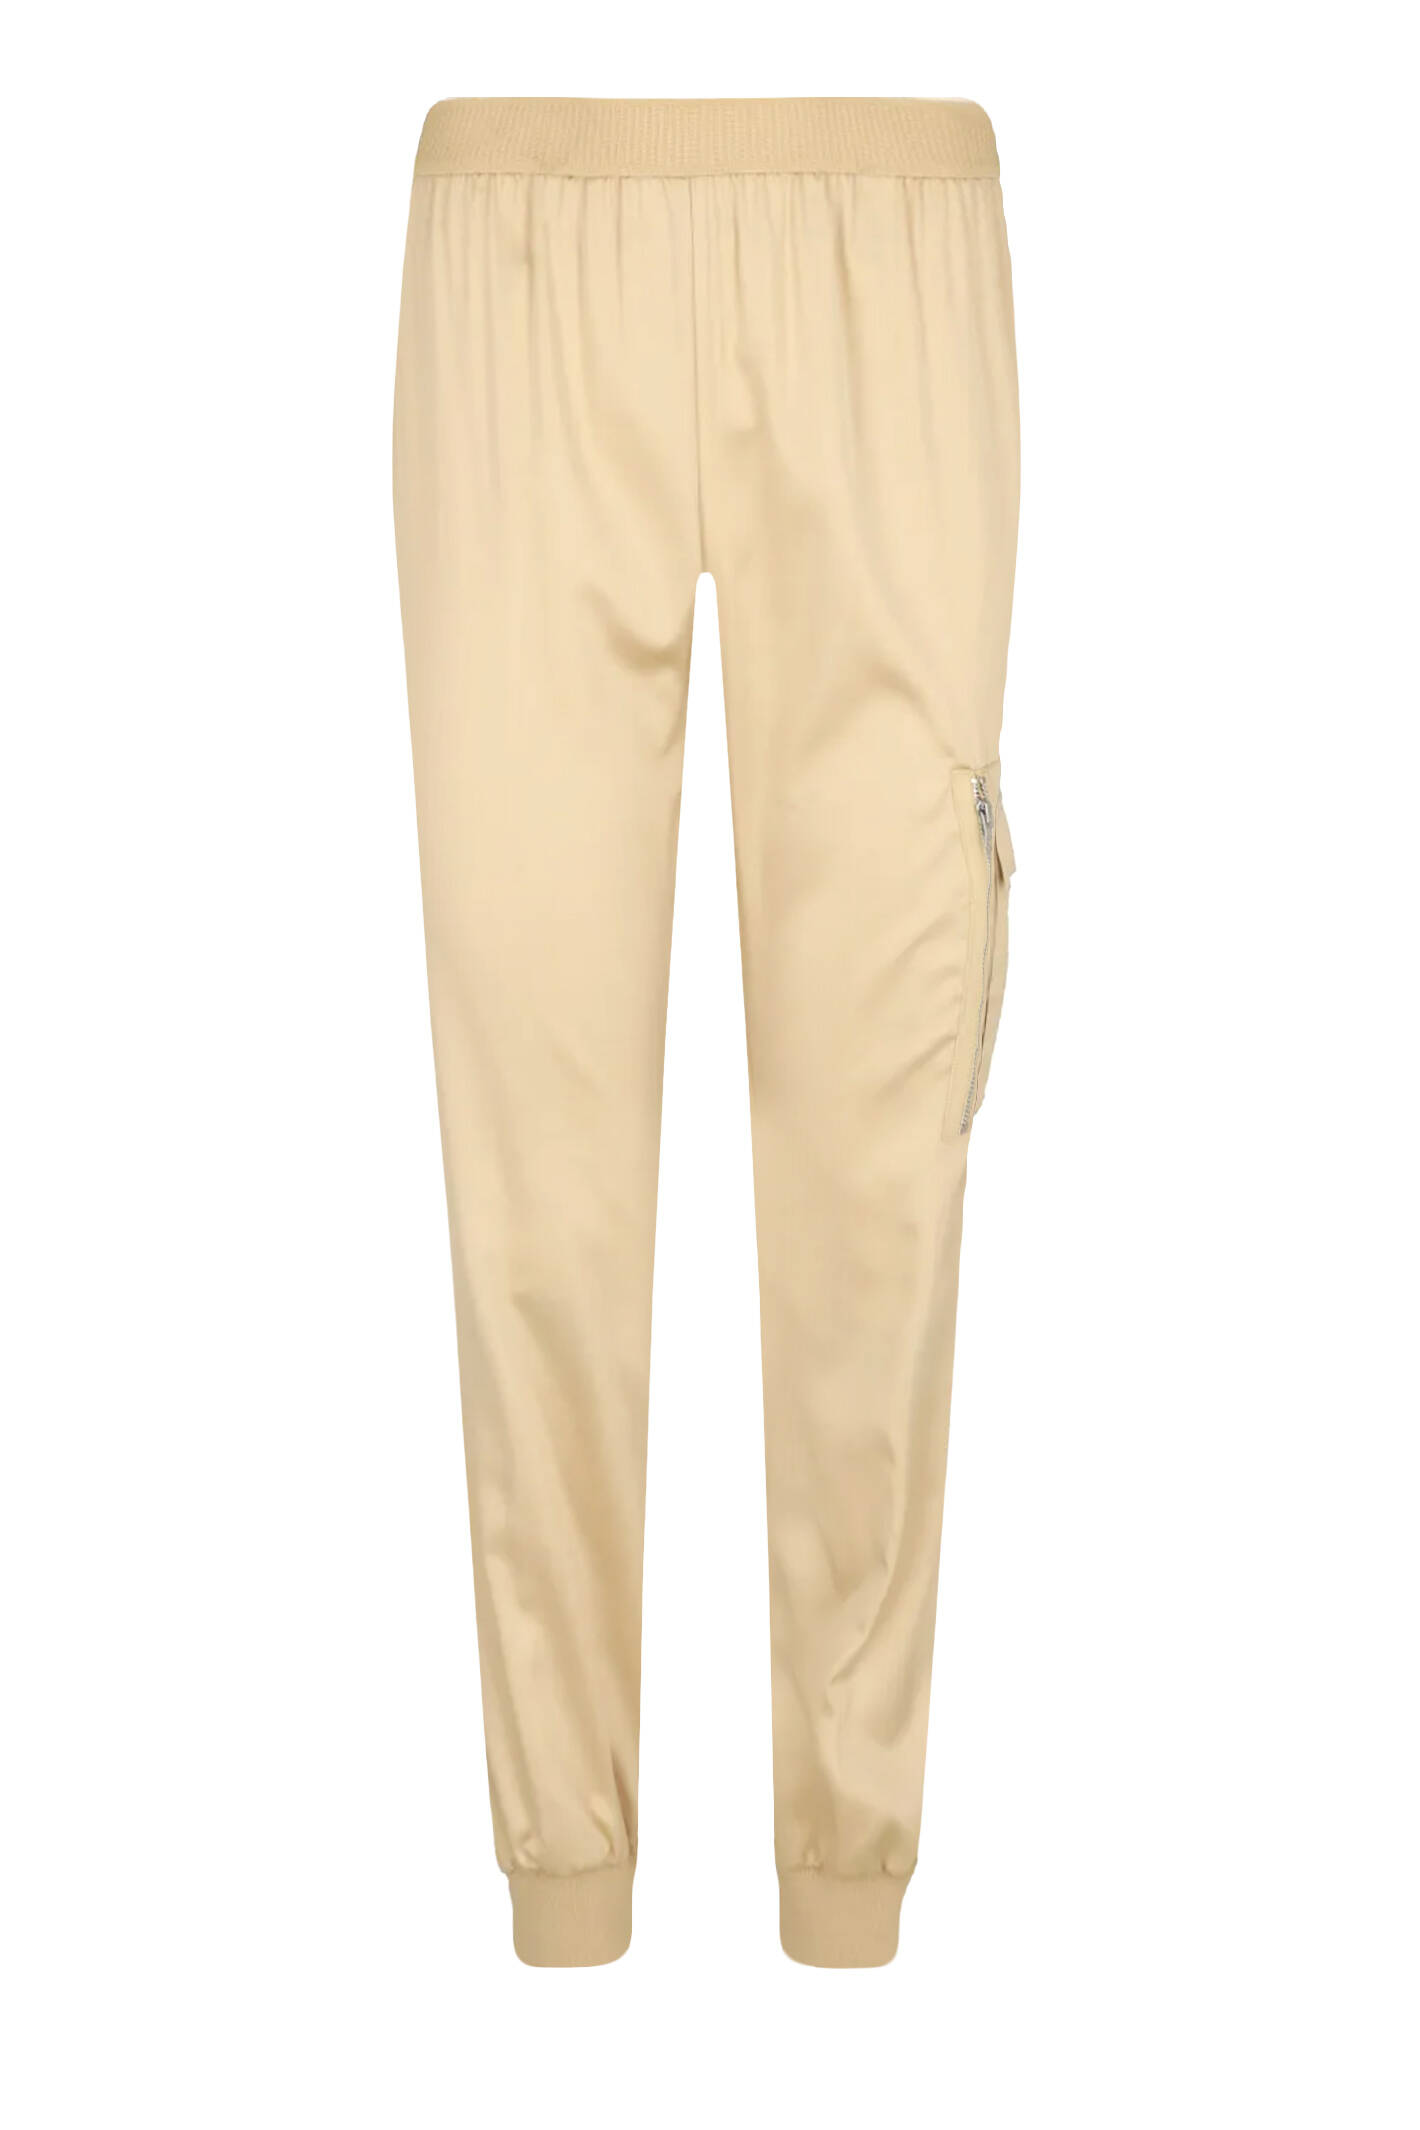 Cатенен спортен панталон | Regular Fit My Twin | бежов | Gomez.bg